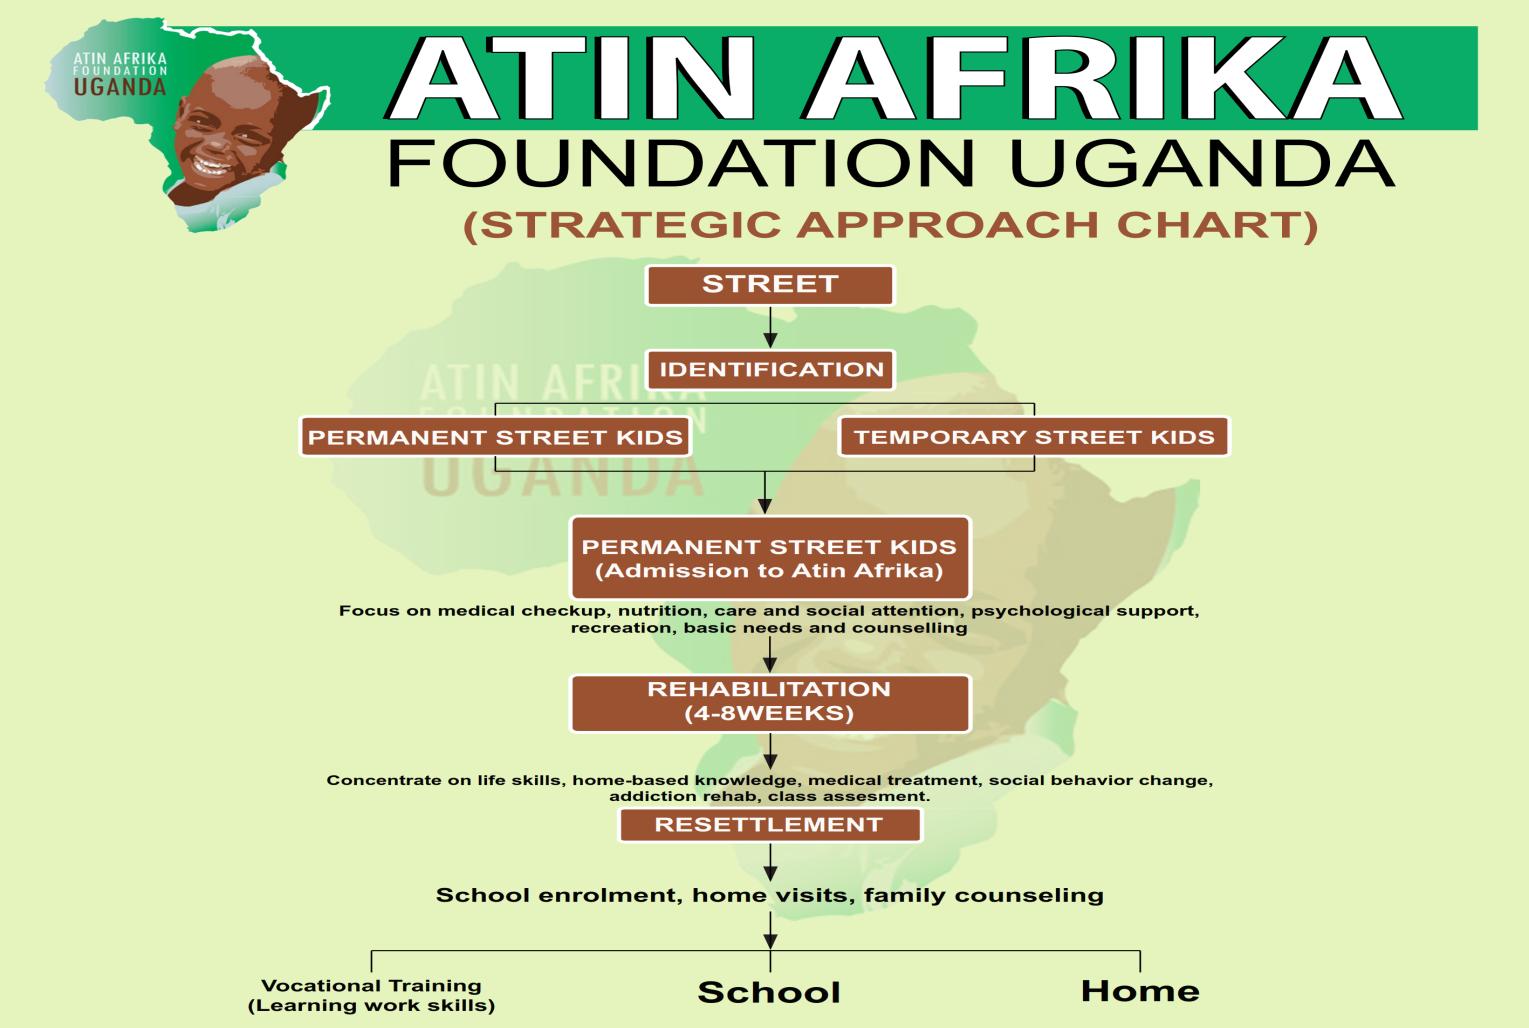 Atin Afrika uses a successful rehabilitation model as outline above